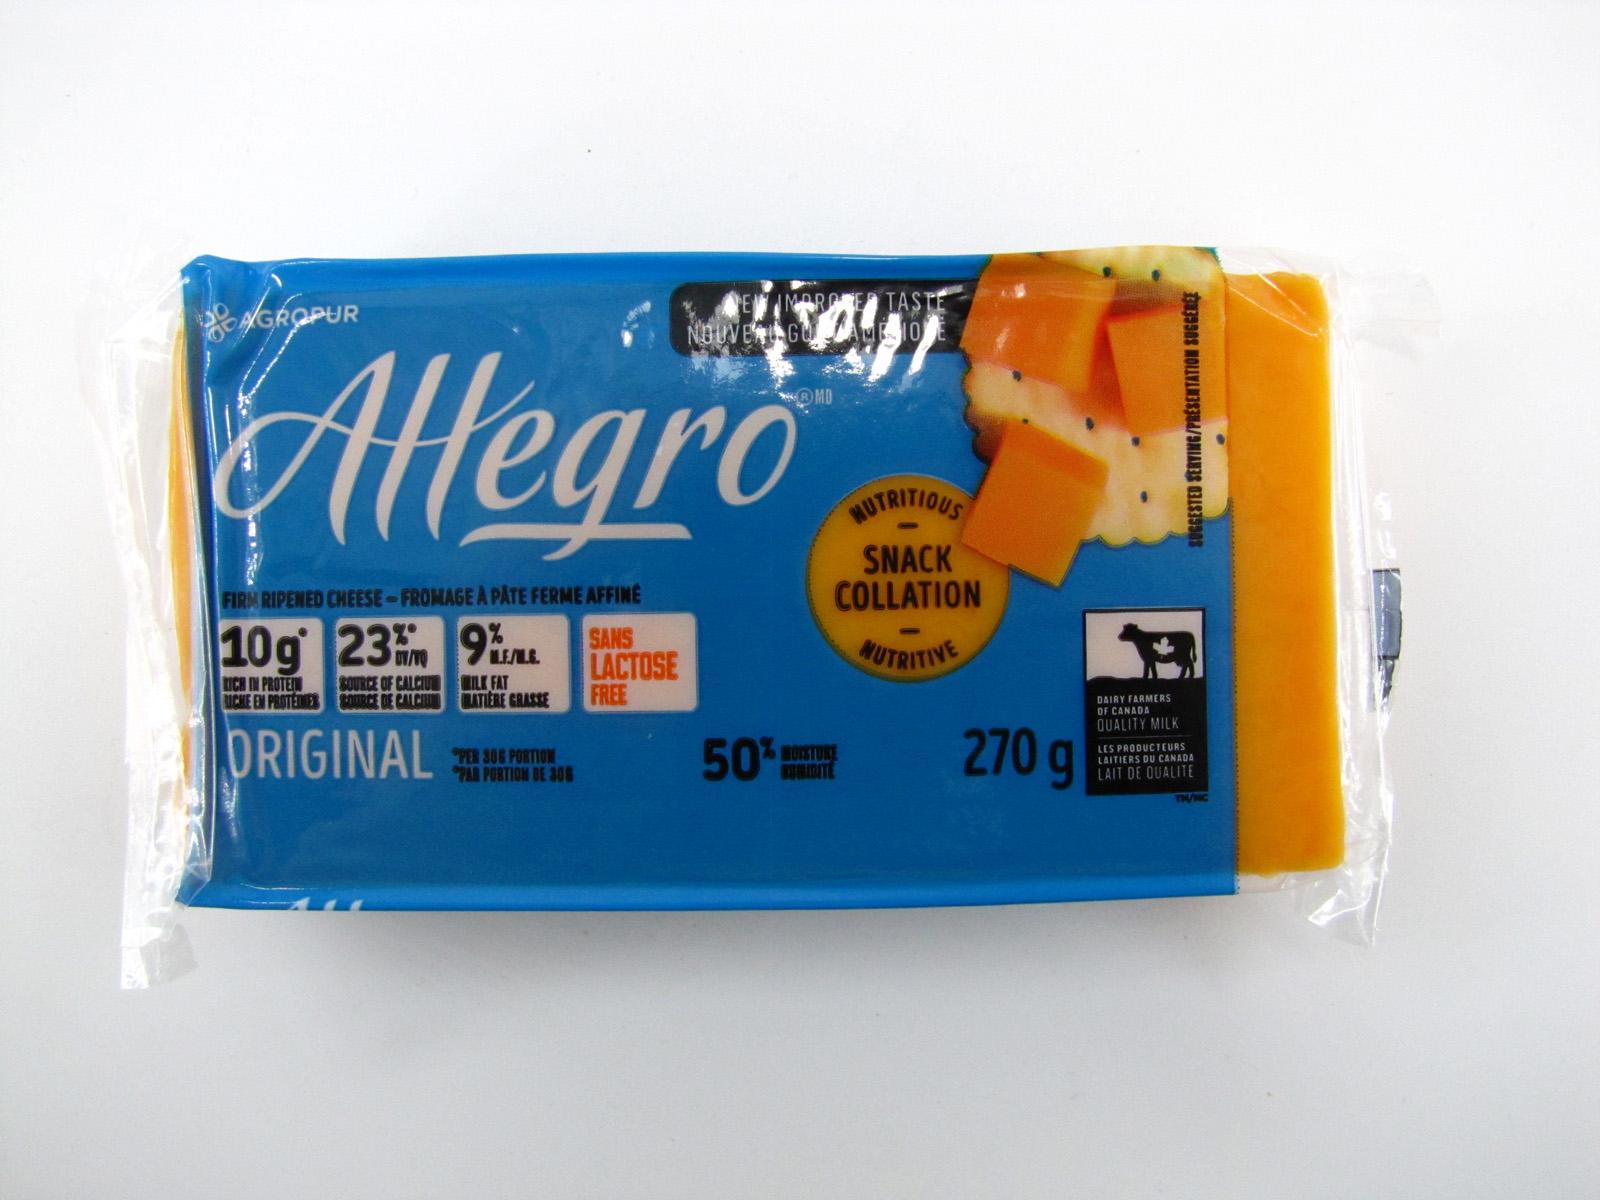 Allegro Cheese - Original Coloured front image